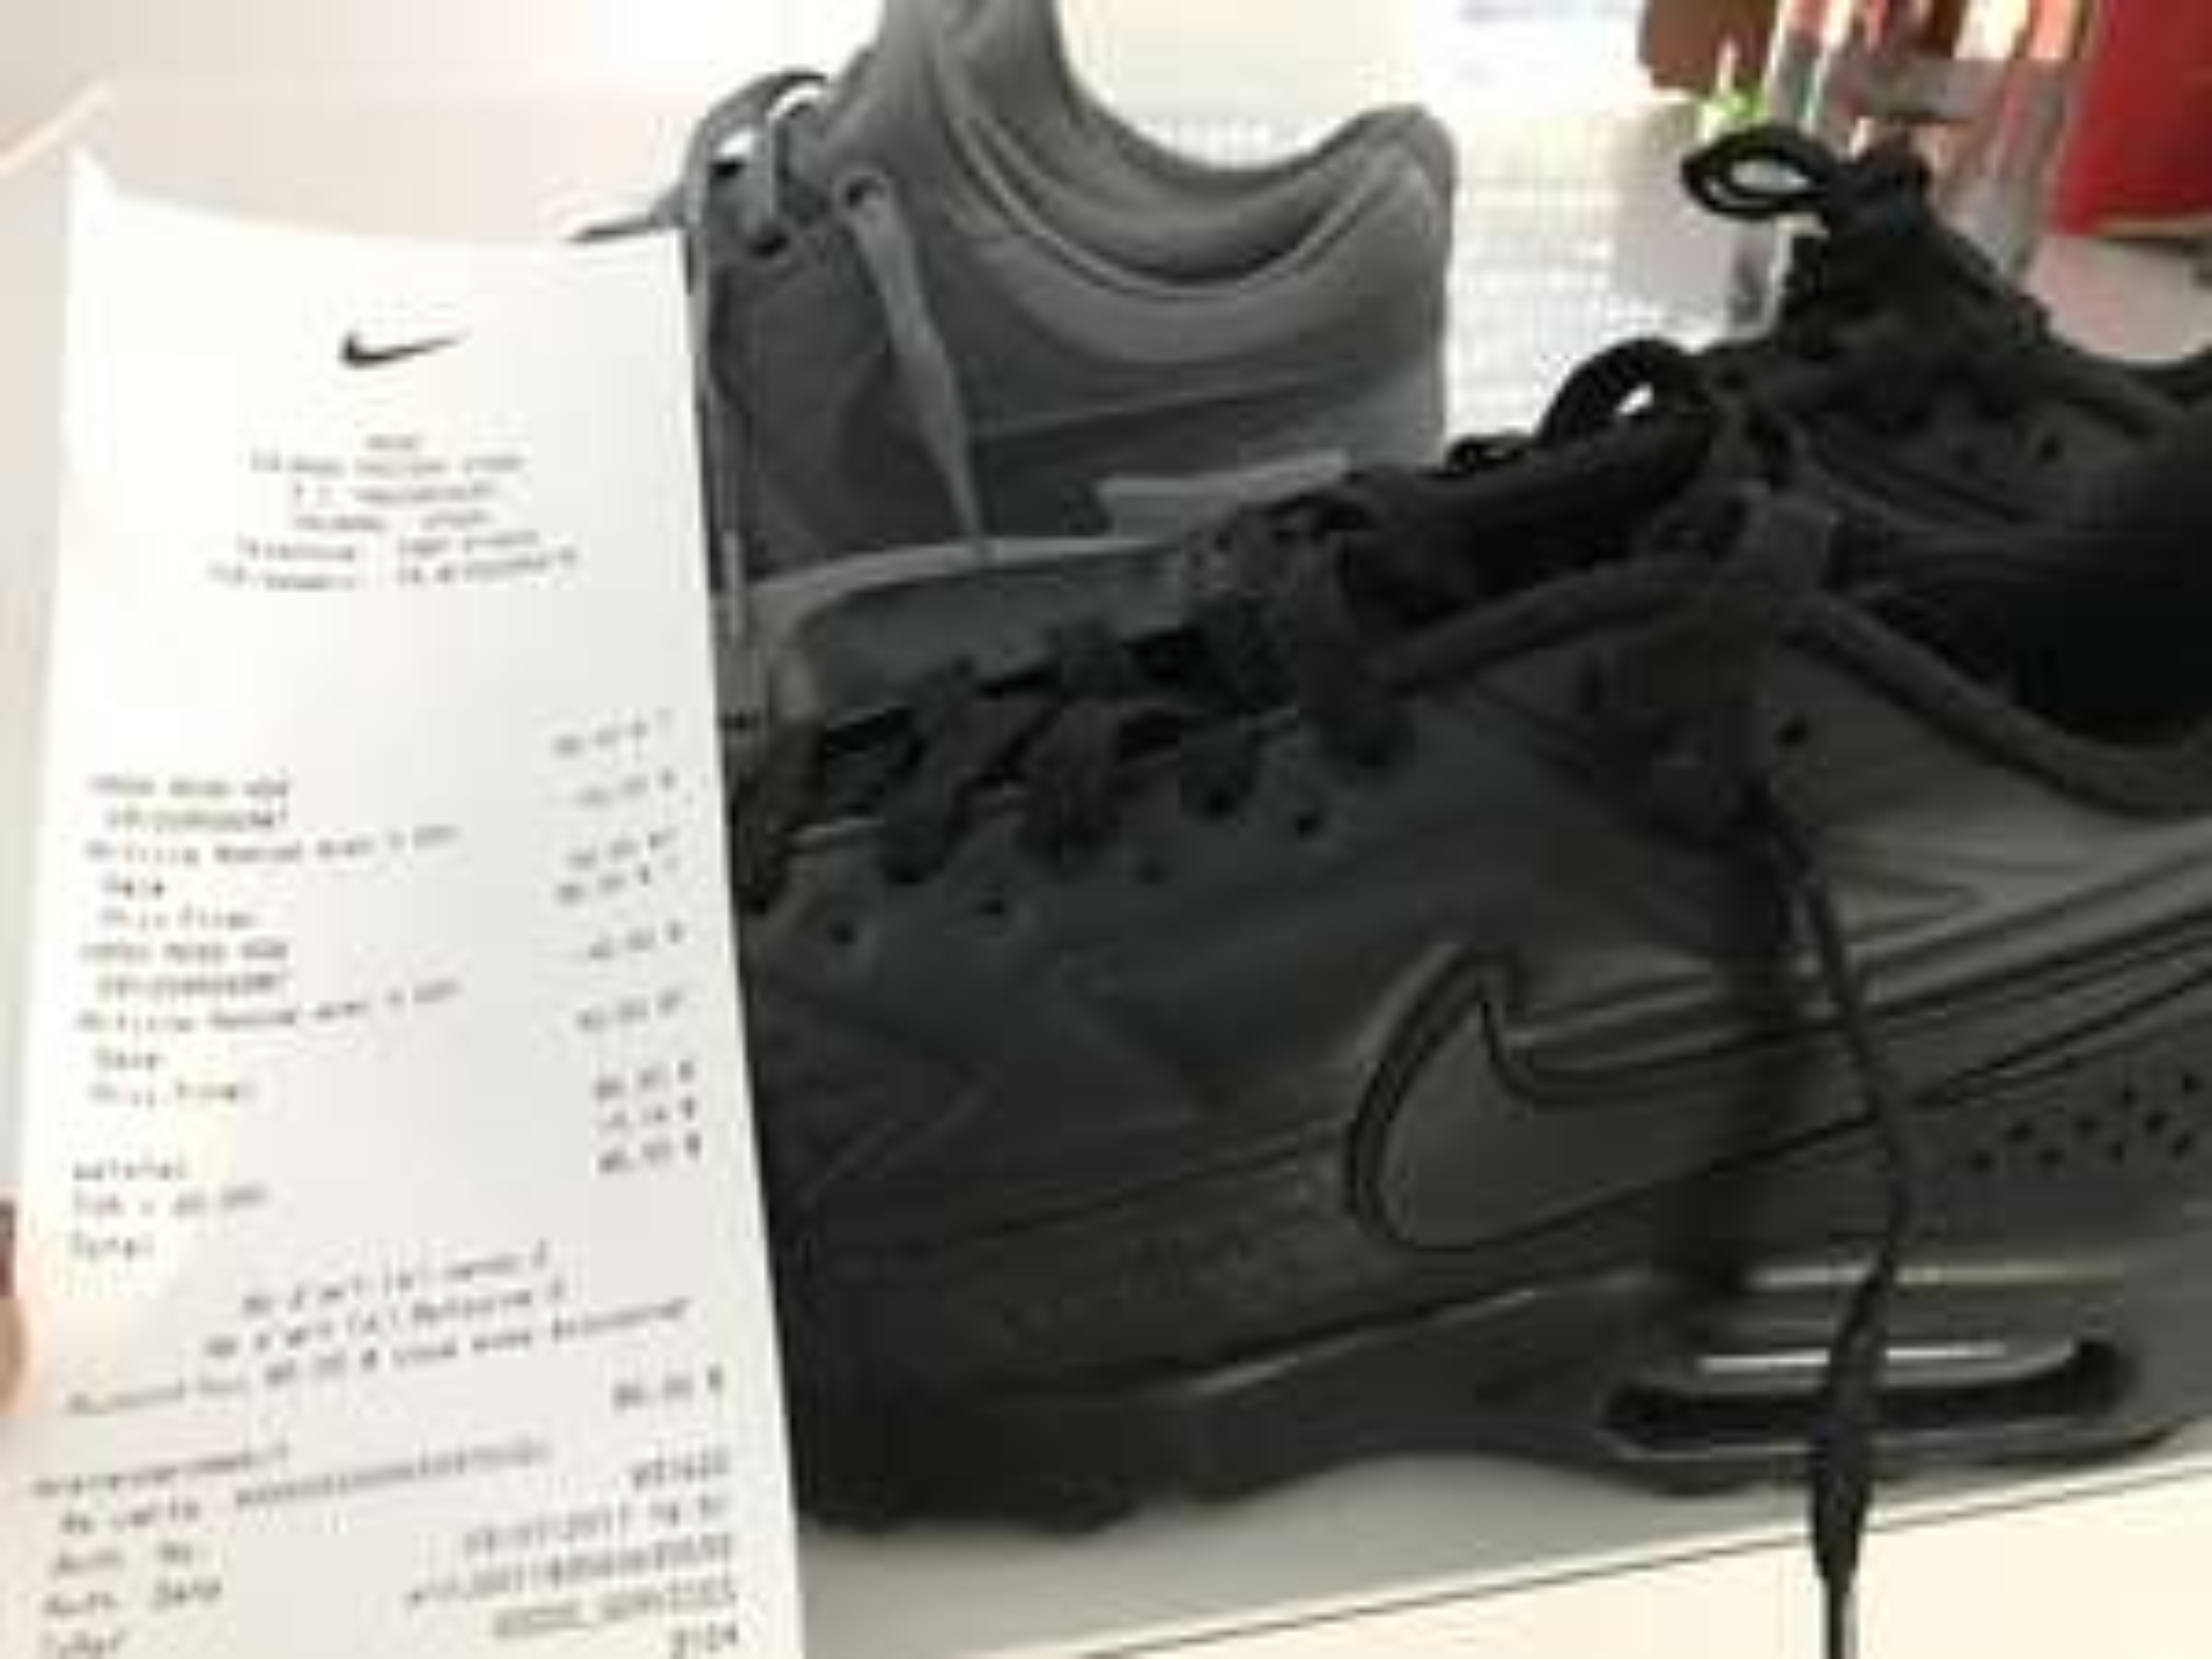 Sélection de chaussures Nike en soldes - Ex : Chaussures Nike Air Max BW 90